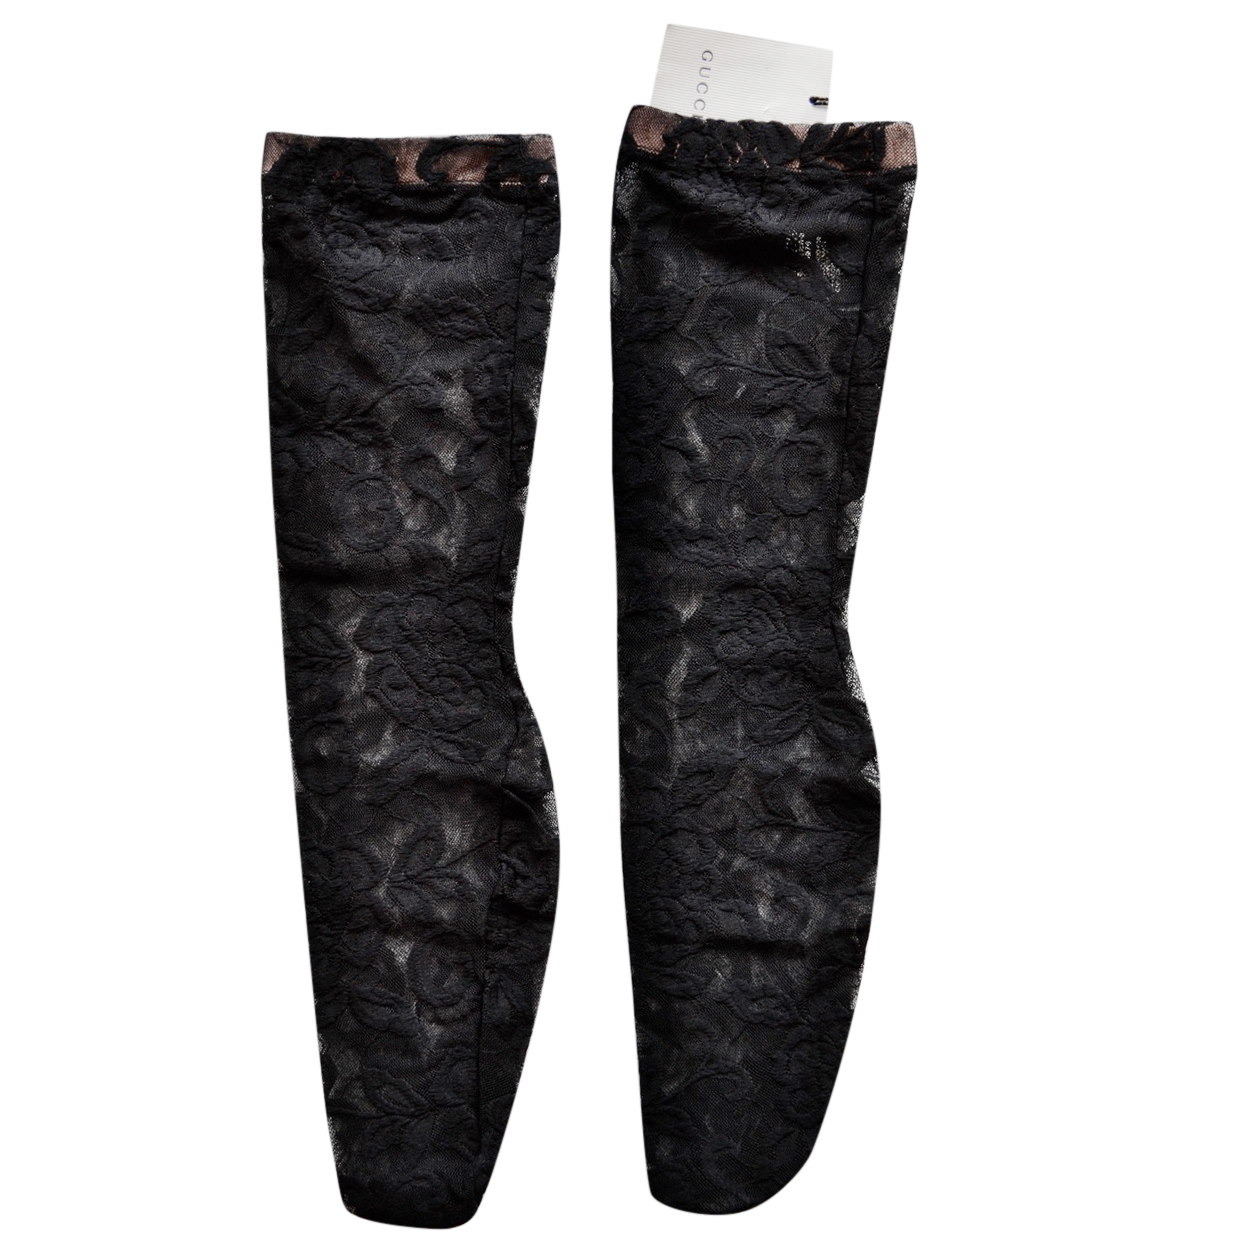 Gucci Black Lace Floral Socks